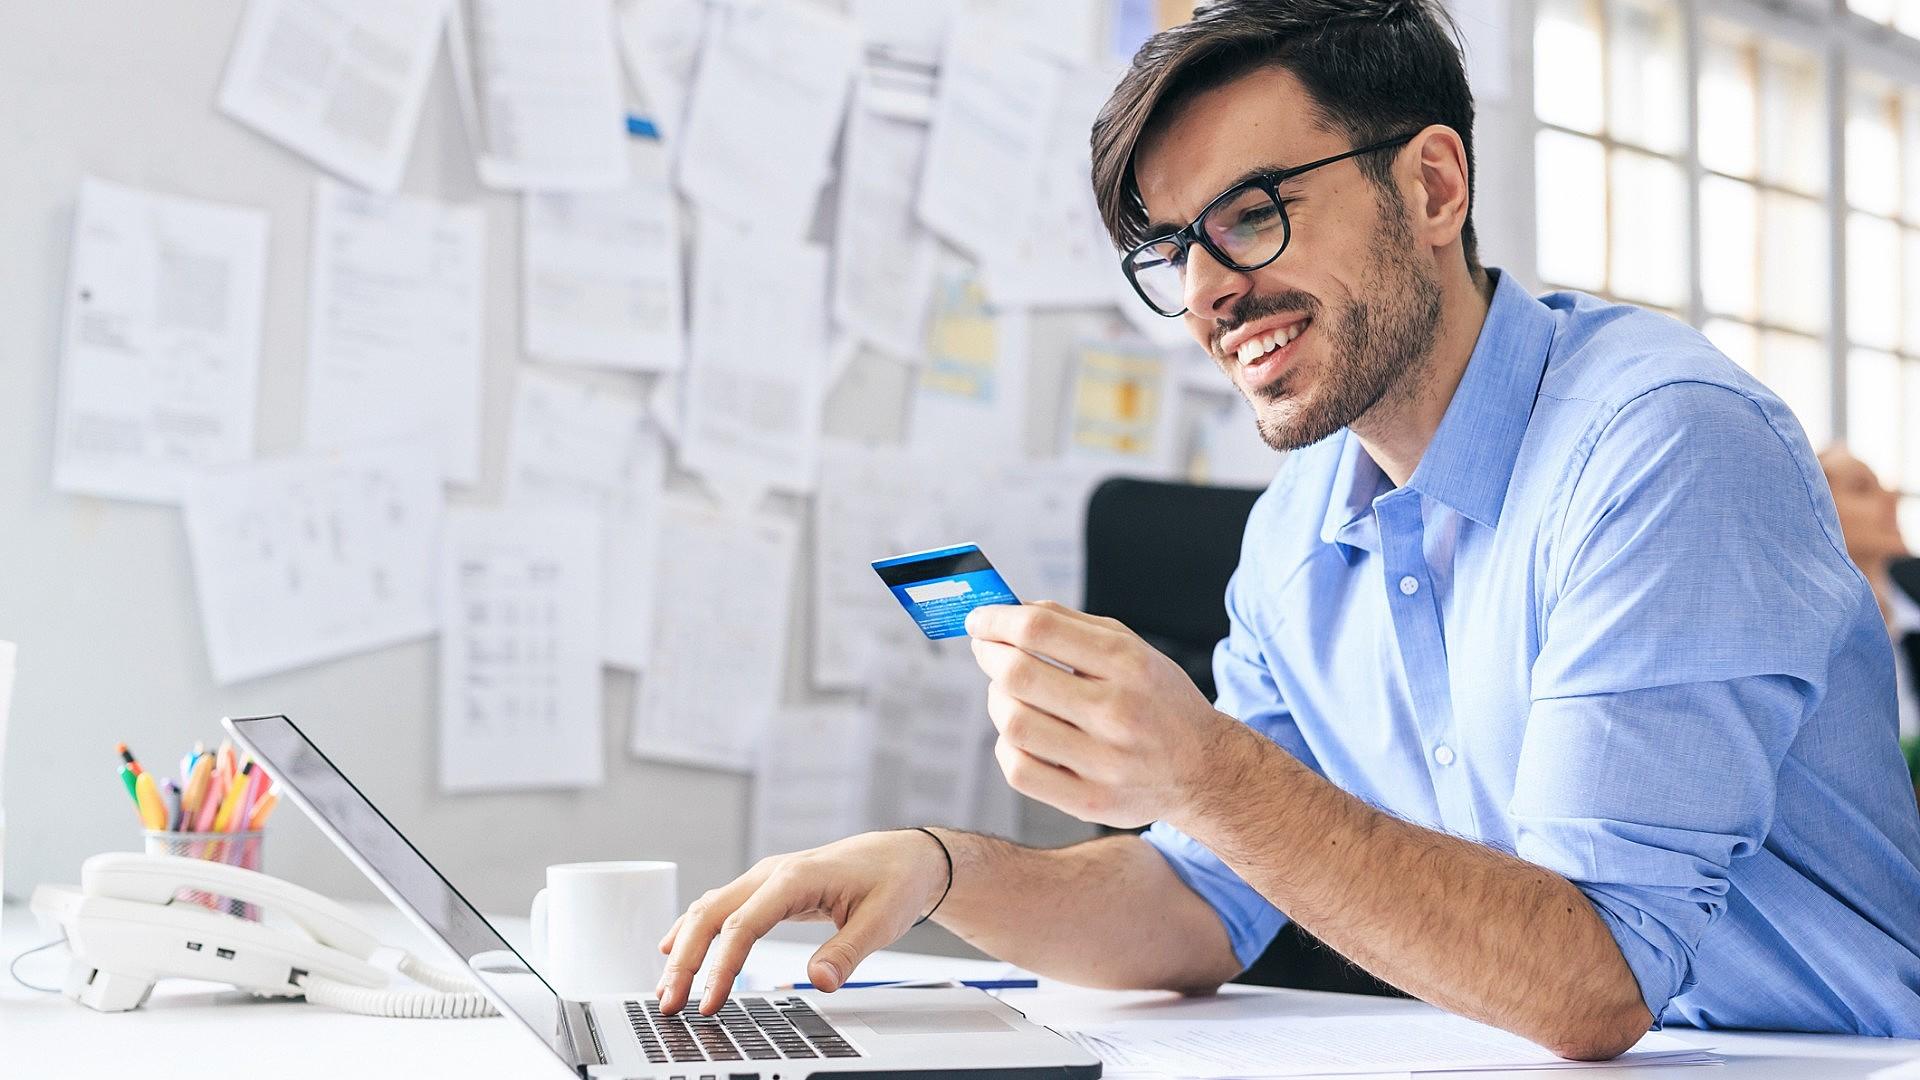 Sucesso do cliente no e-commerce? Confira como garanti-lo!